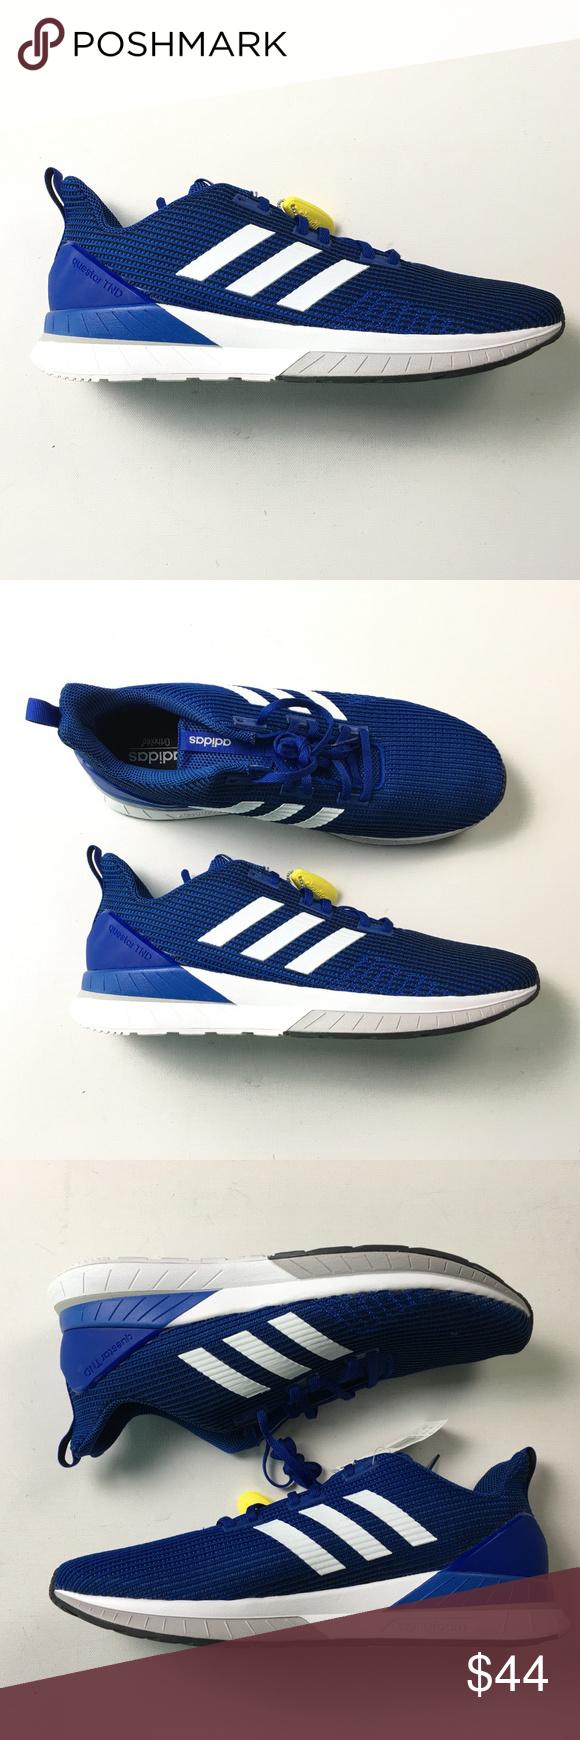 86071479d05b Adidas Mens Blue Sneakers 13 A65 x01775 Adidas Mens Blue Questar TND  Running Shoes Sneakers